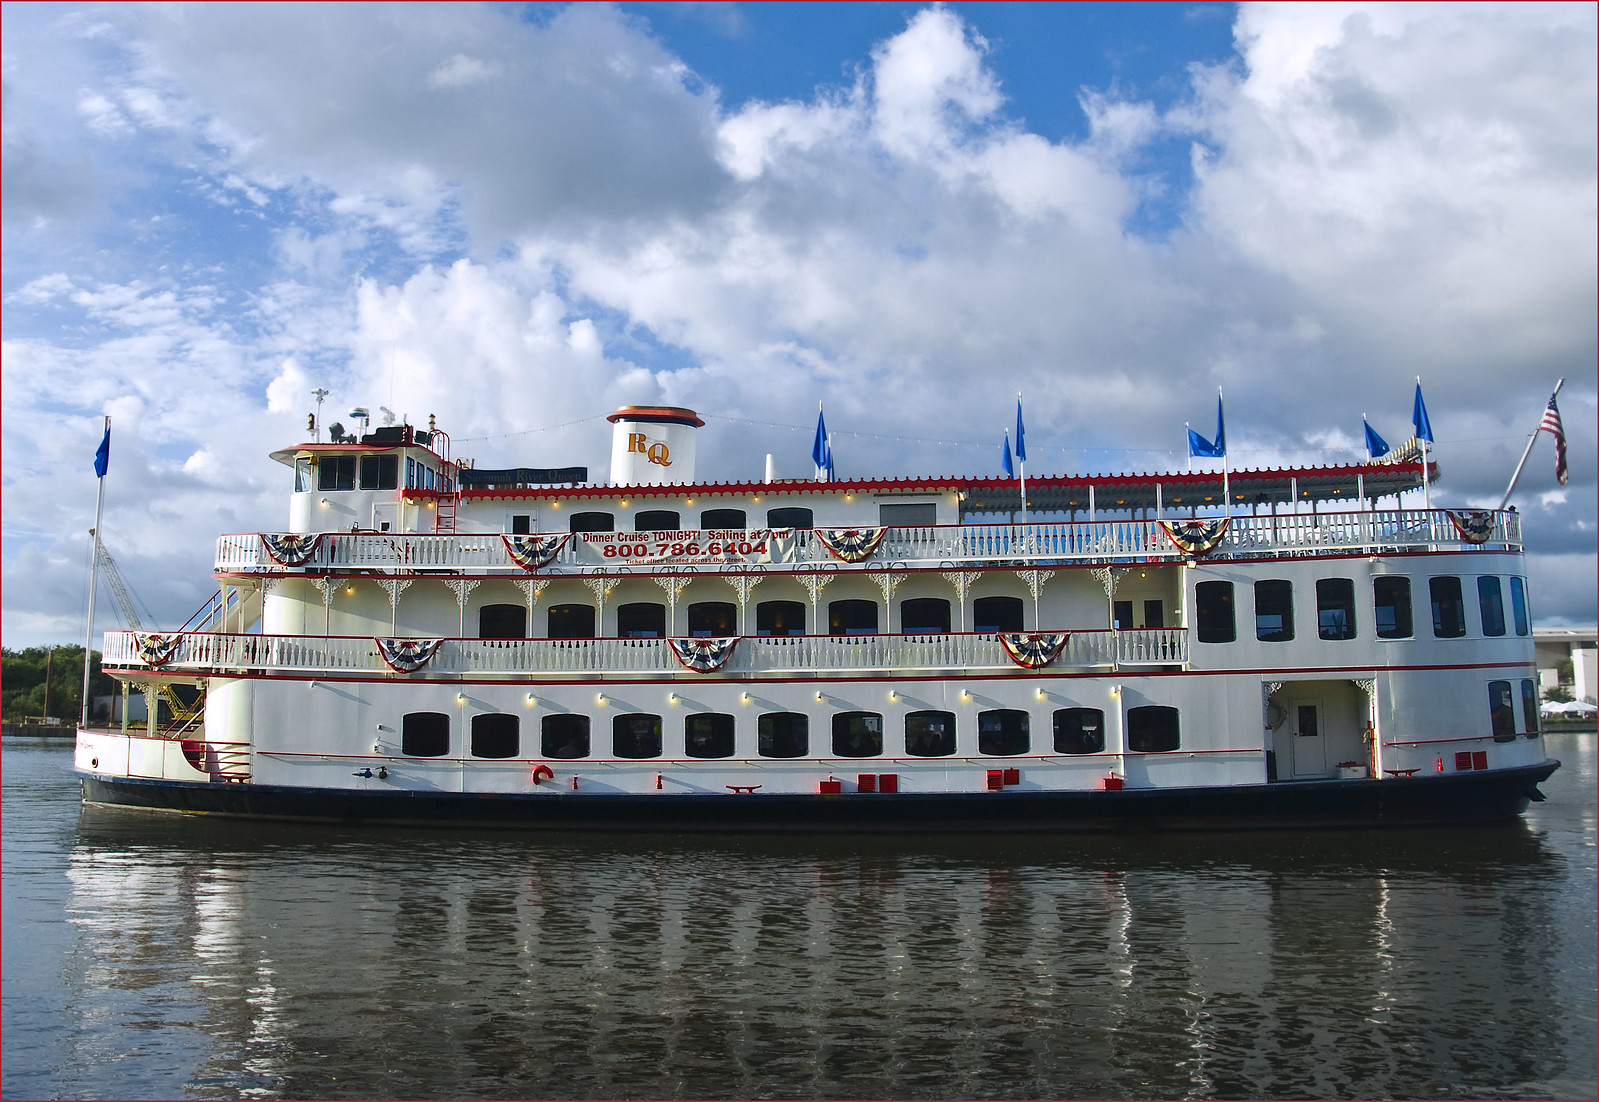 'The Savannah River Queen' -- On the Savannah River at Savannah (GA) July 2012